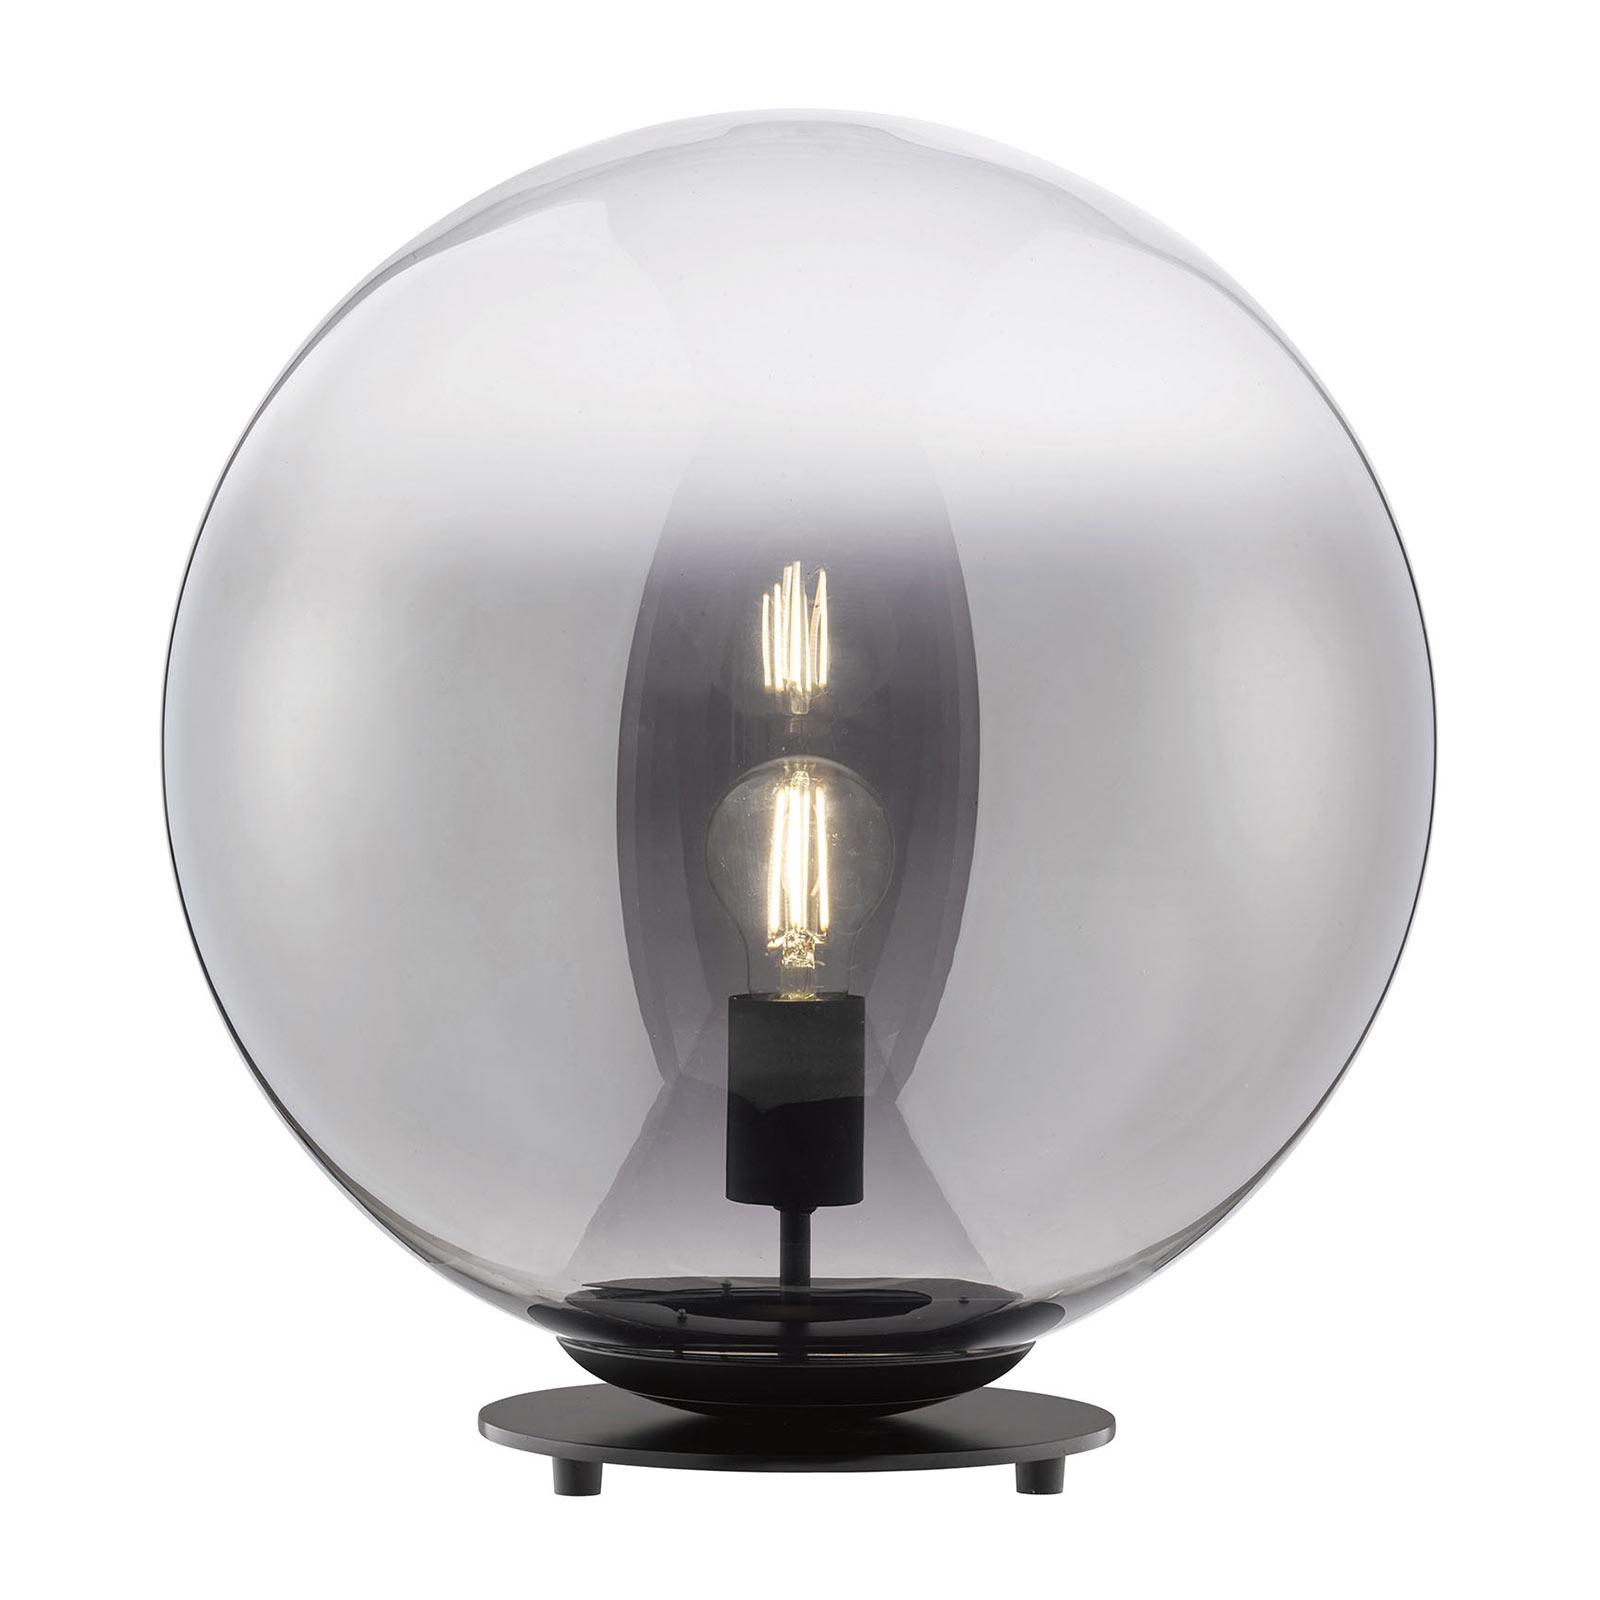 Mooier wonen Mirror tafellamp, Ø 40 cm